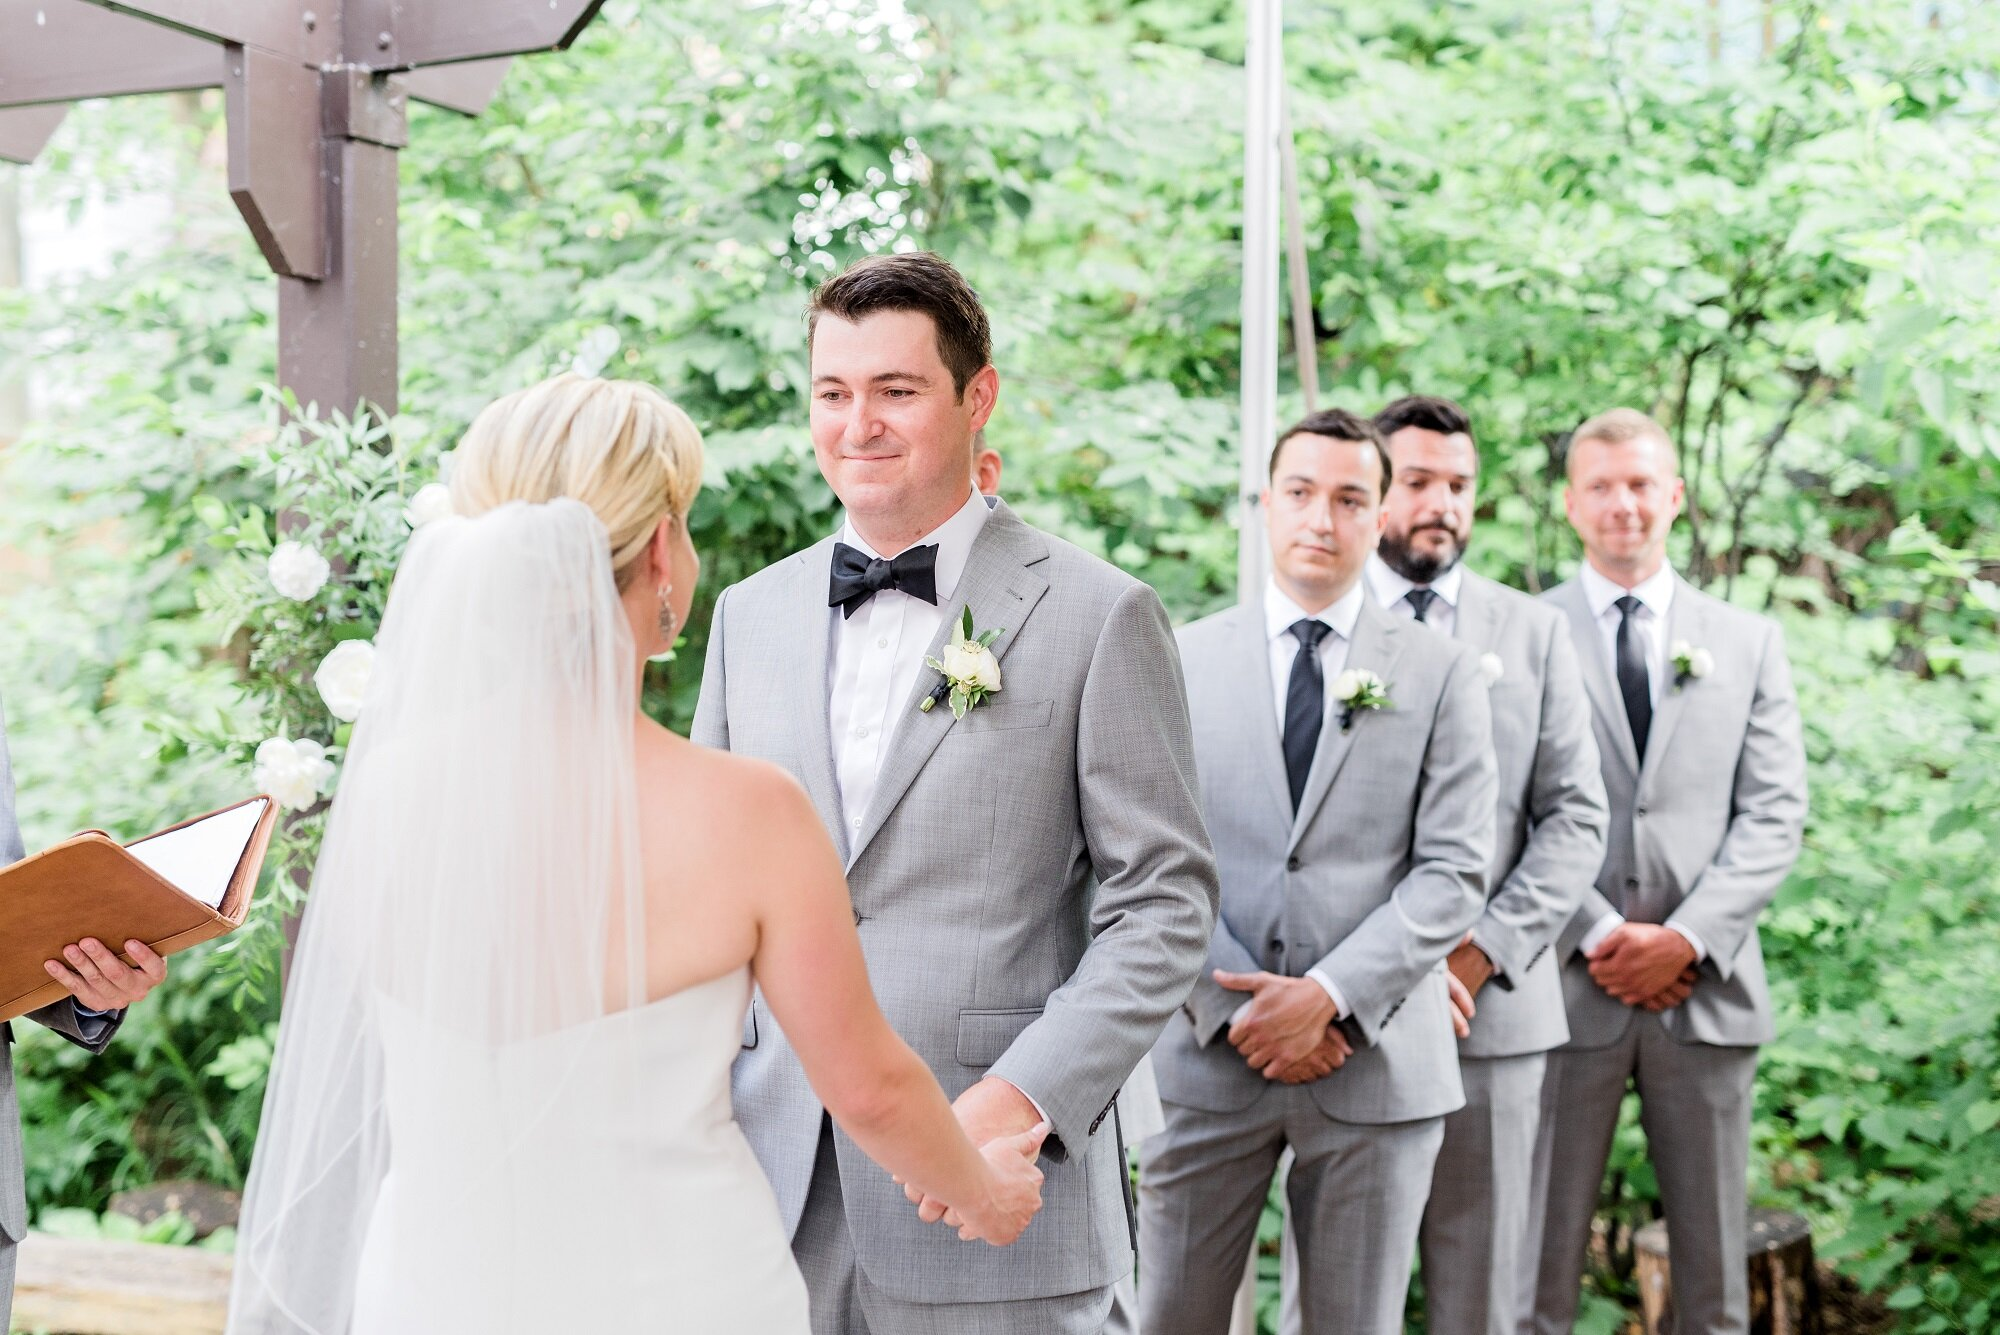 berkeley-field-house-wedding-kj-and-co-18.jpg